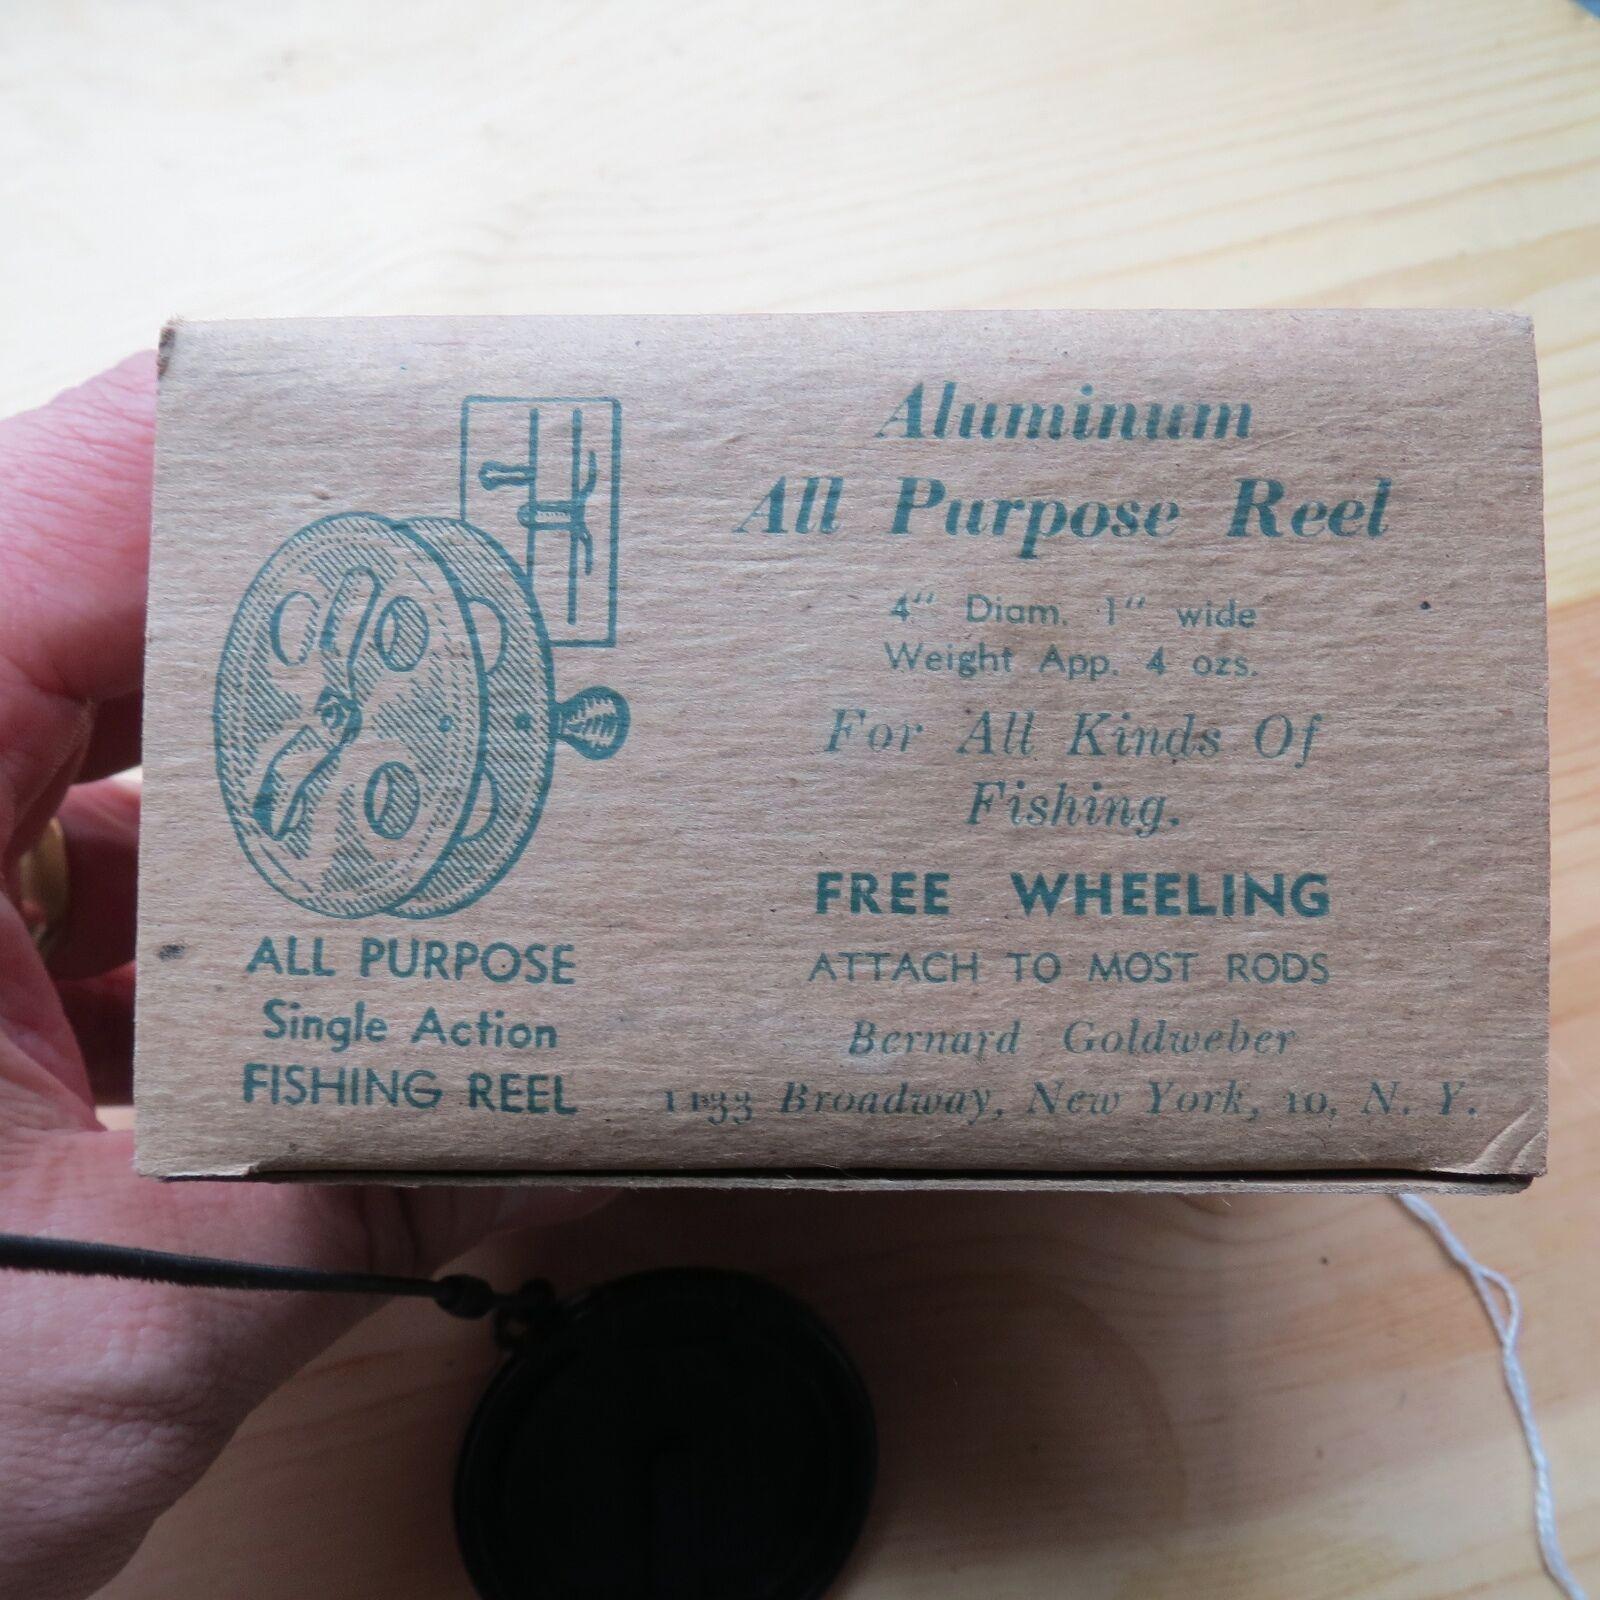 Vintage Rare fishing reel Bernard  goldweber All Purpose reel (lot)  new products novelty items